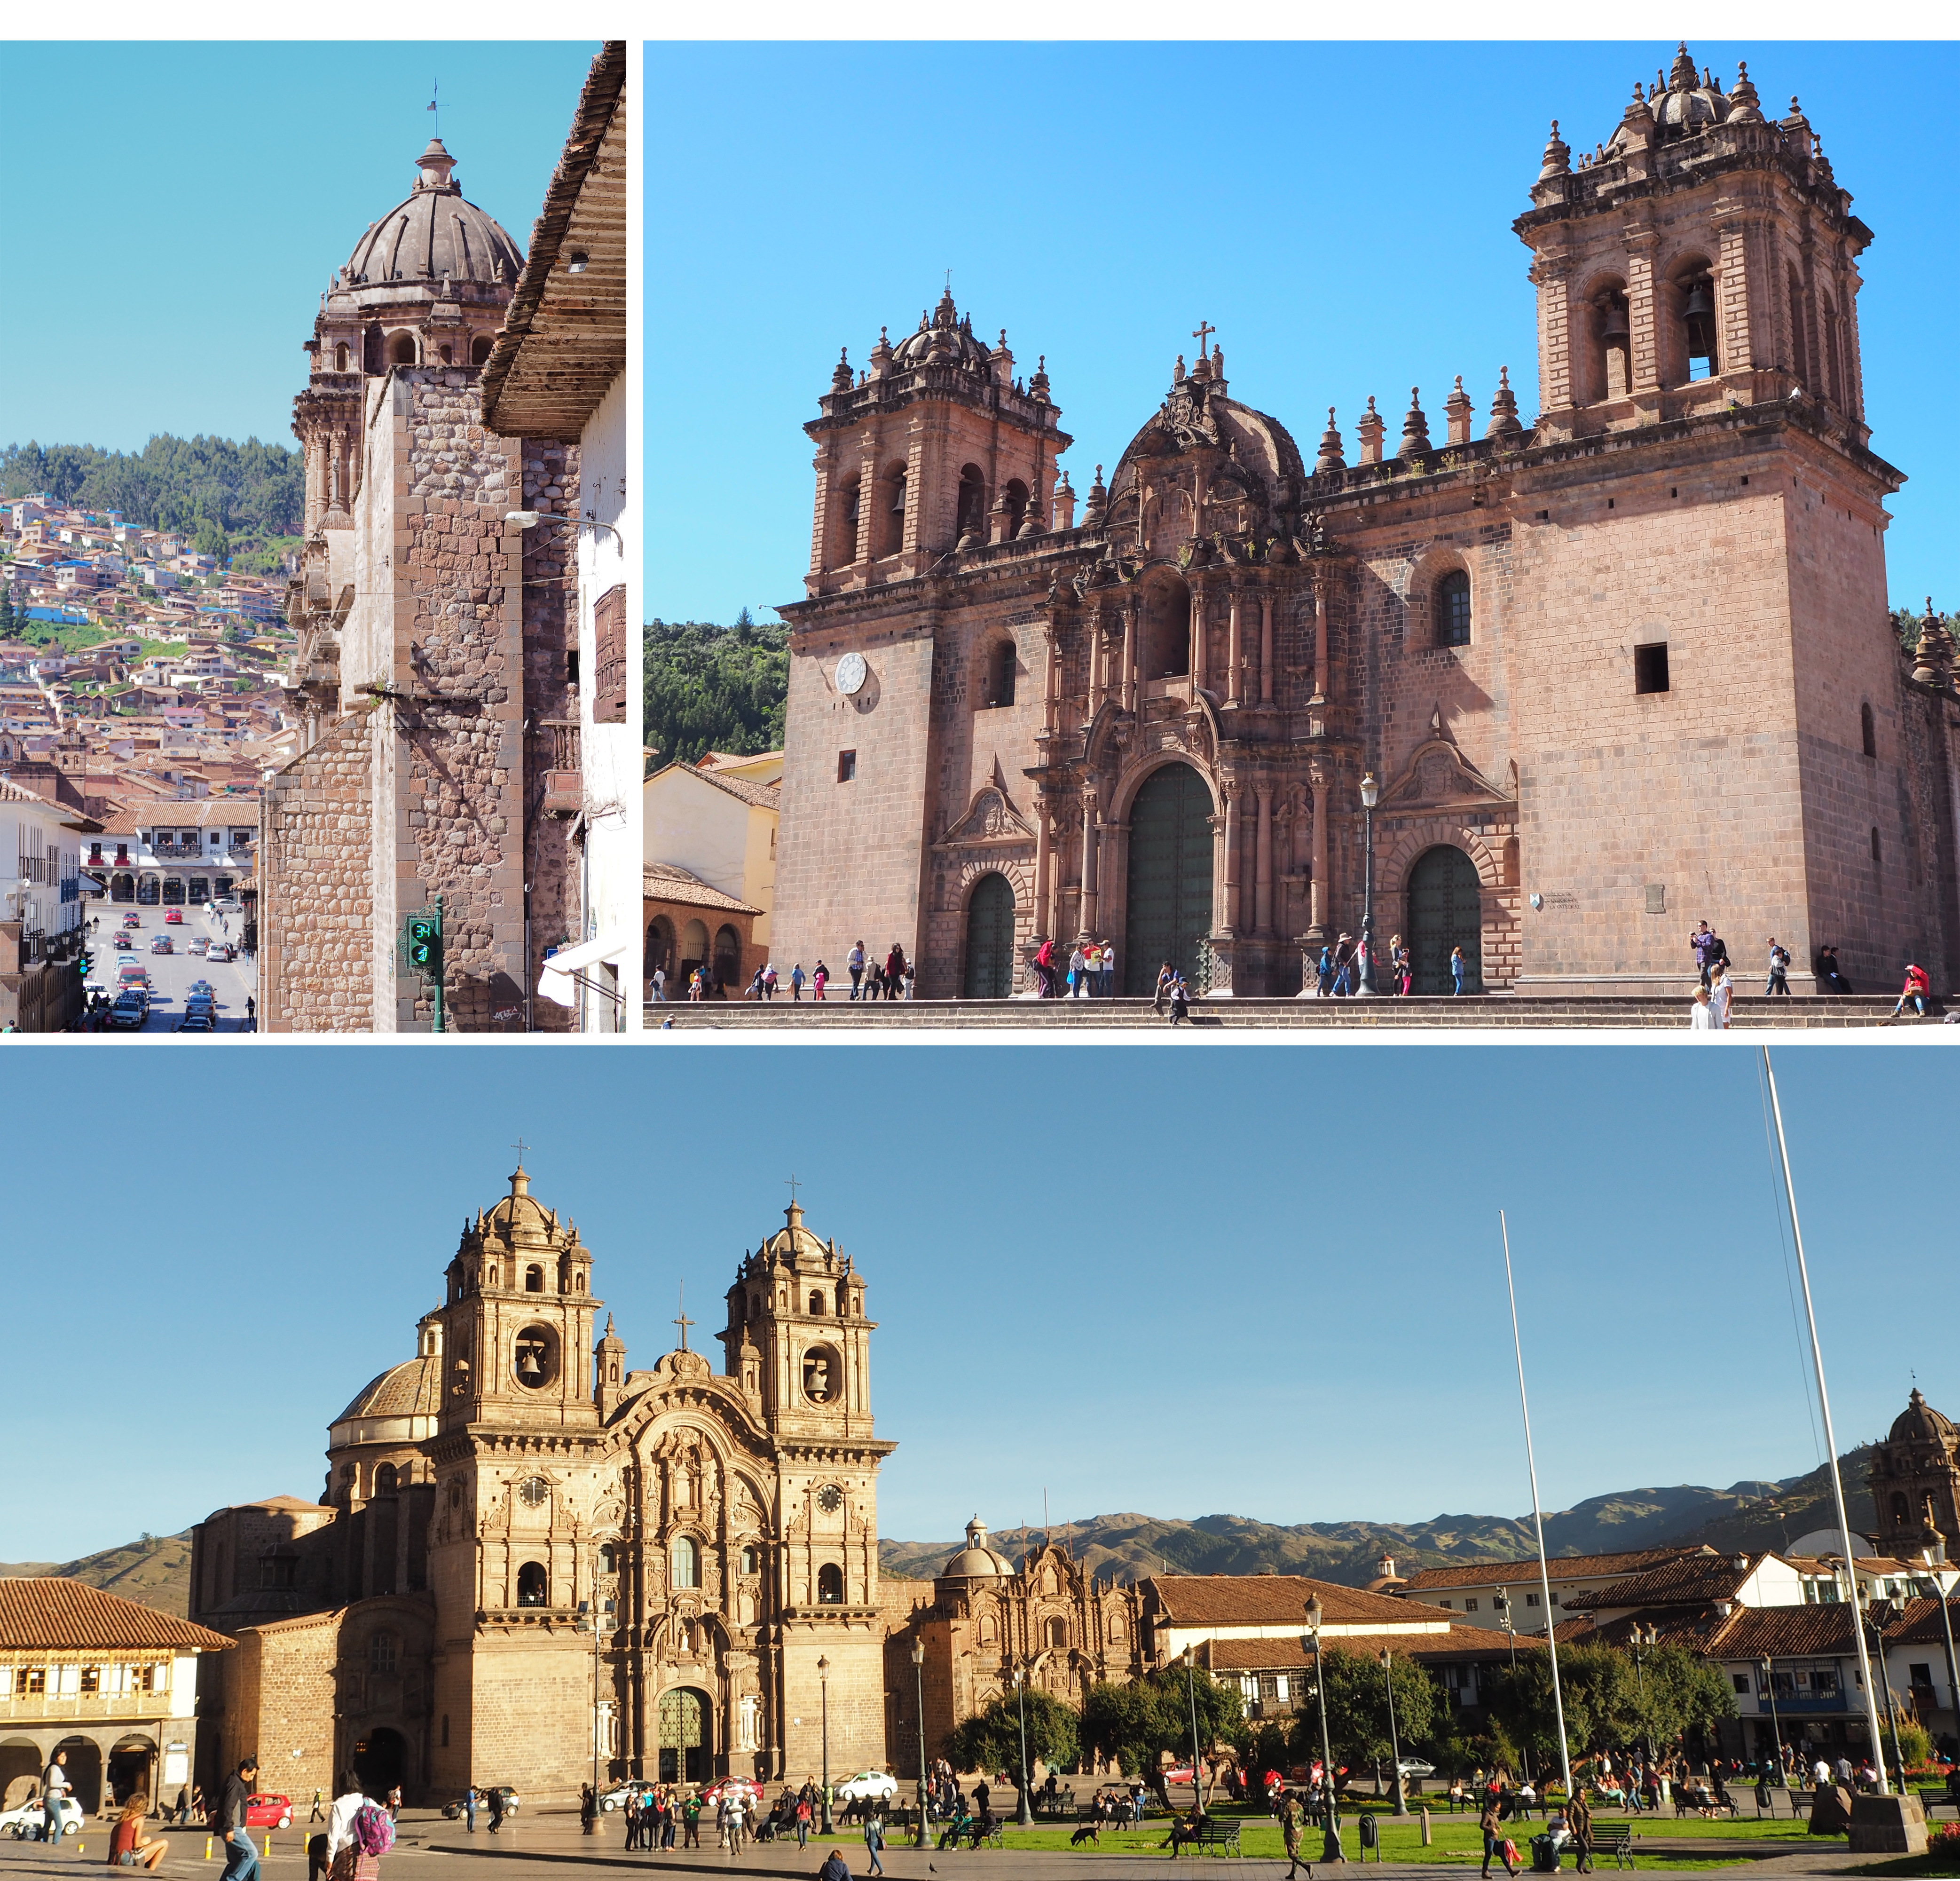 Cusco - plazza armas